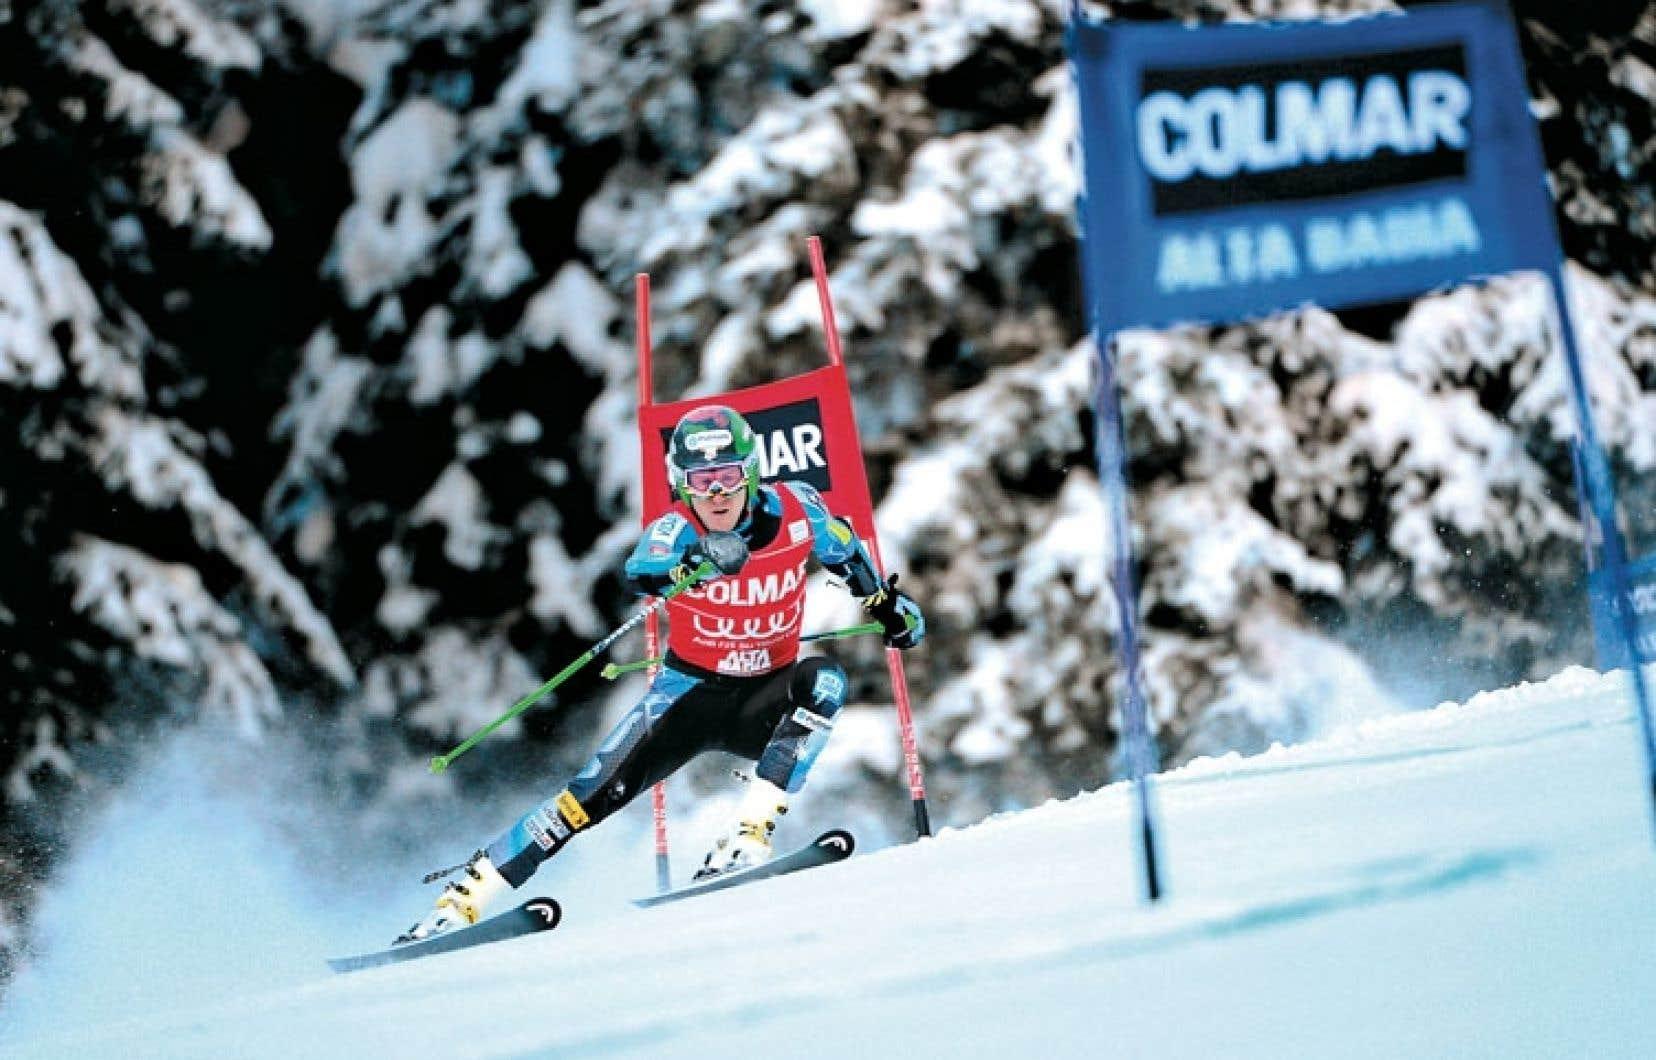 <div> Ted Ligety totalise 14 victoires en Coupe du monde, toutes inscrites en slalom géant.</div>